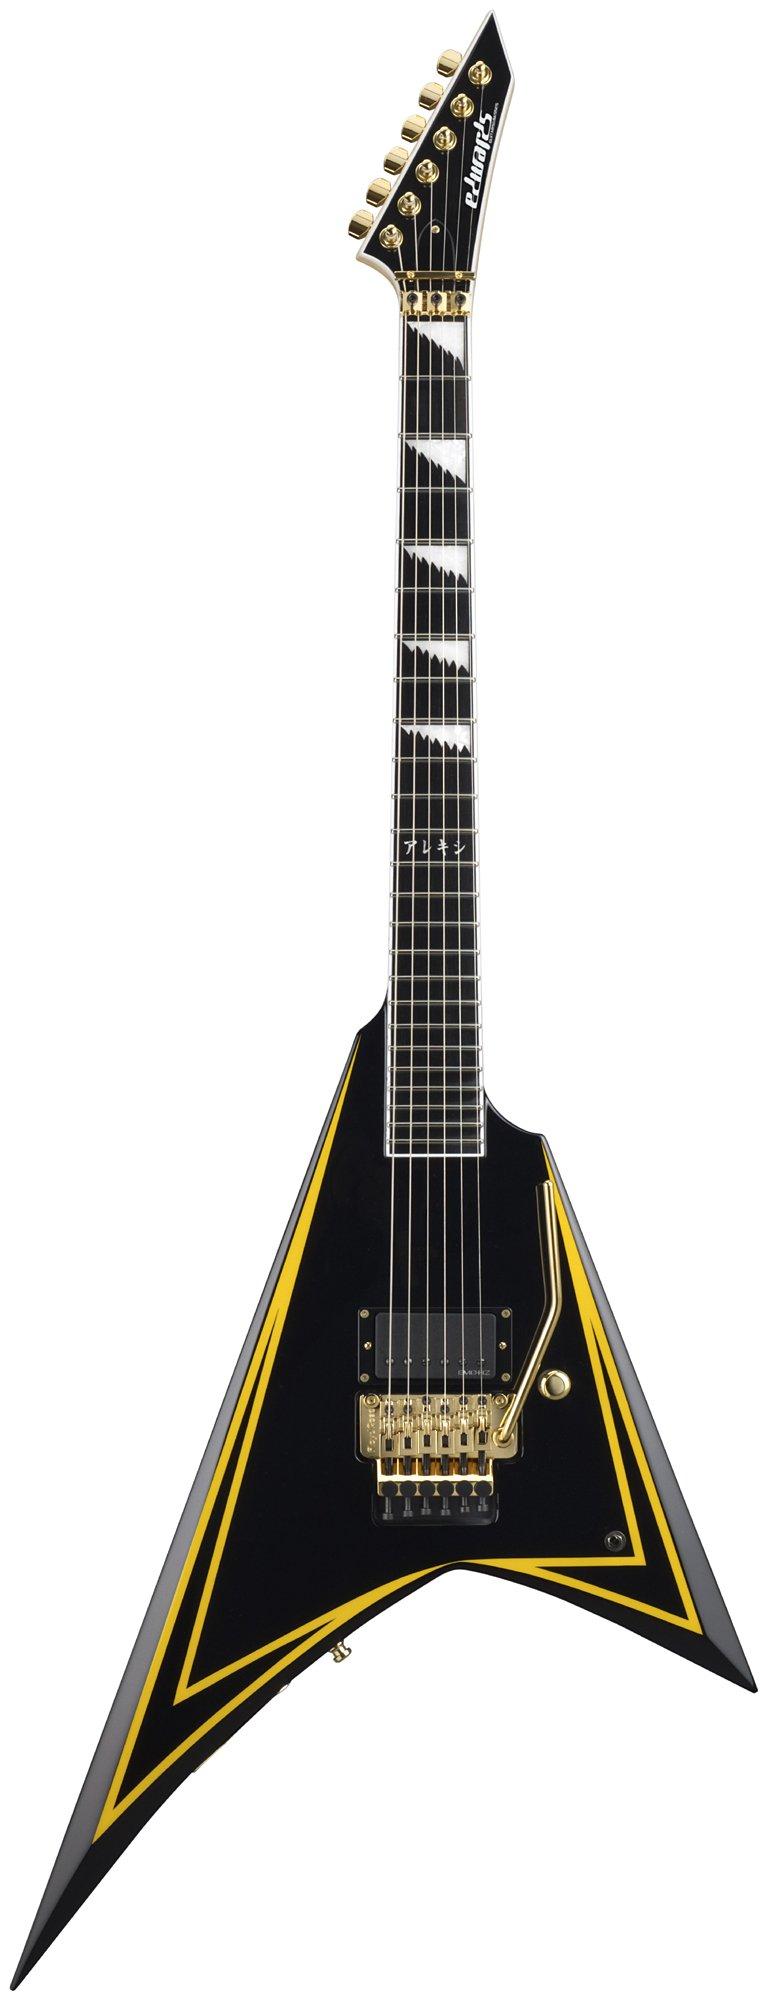 Cheap ESP Edwards E-AL-166 KATAKANA Children Of Bodom Alexi Laiho Signature Japanese Electric Guitar (Japan Import) Black Friday & Cyber Monday 2019